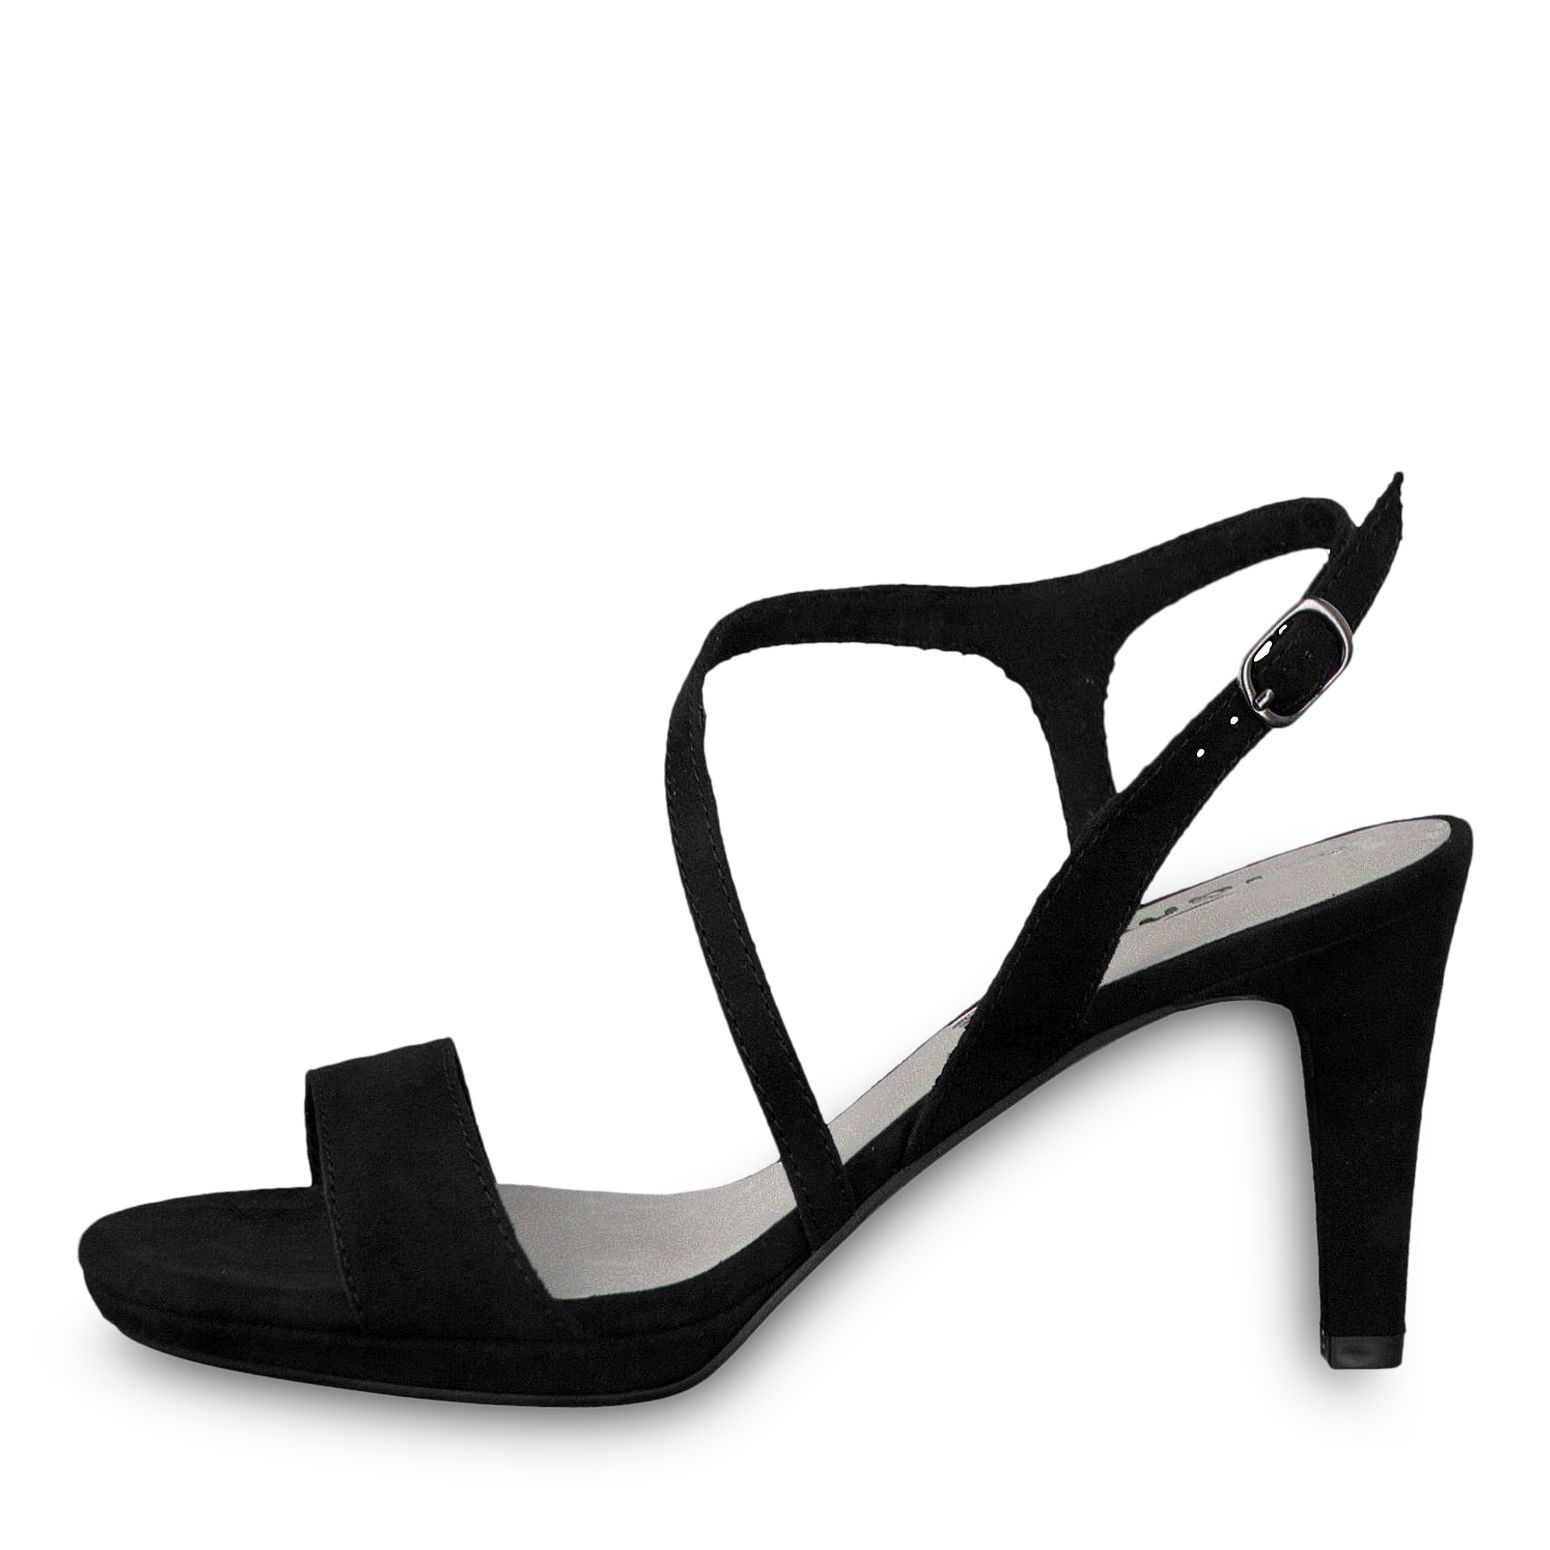 Tamaris High heeled sandals - white gehudnVIf